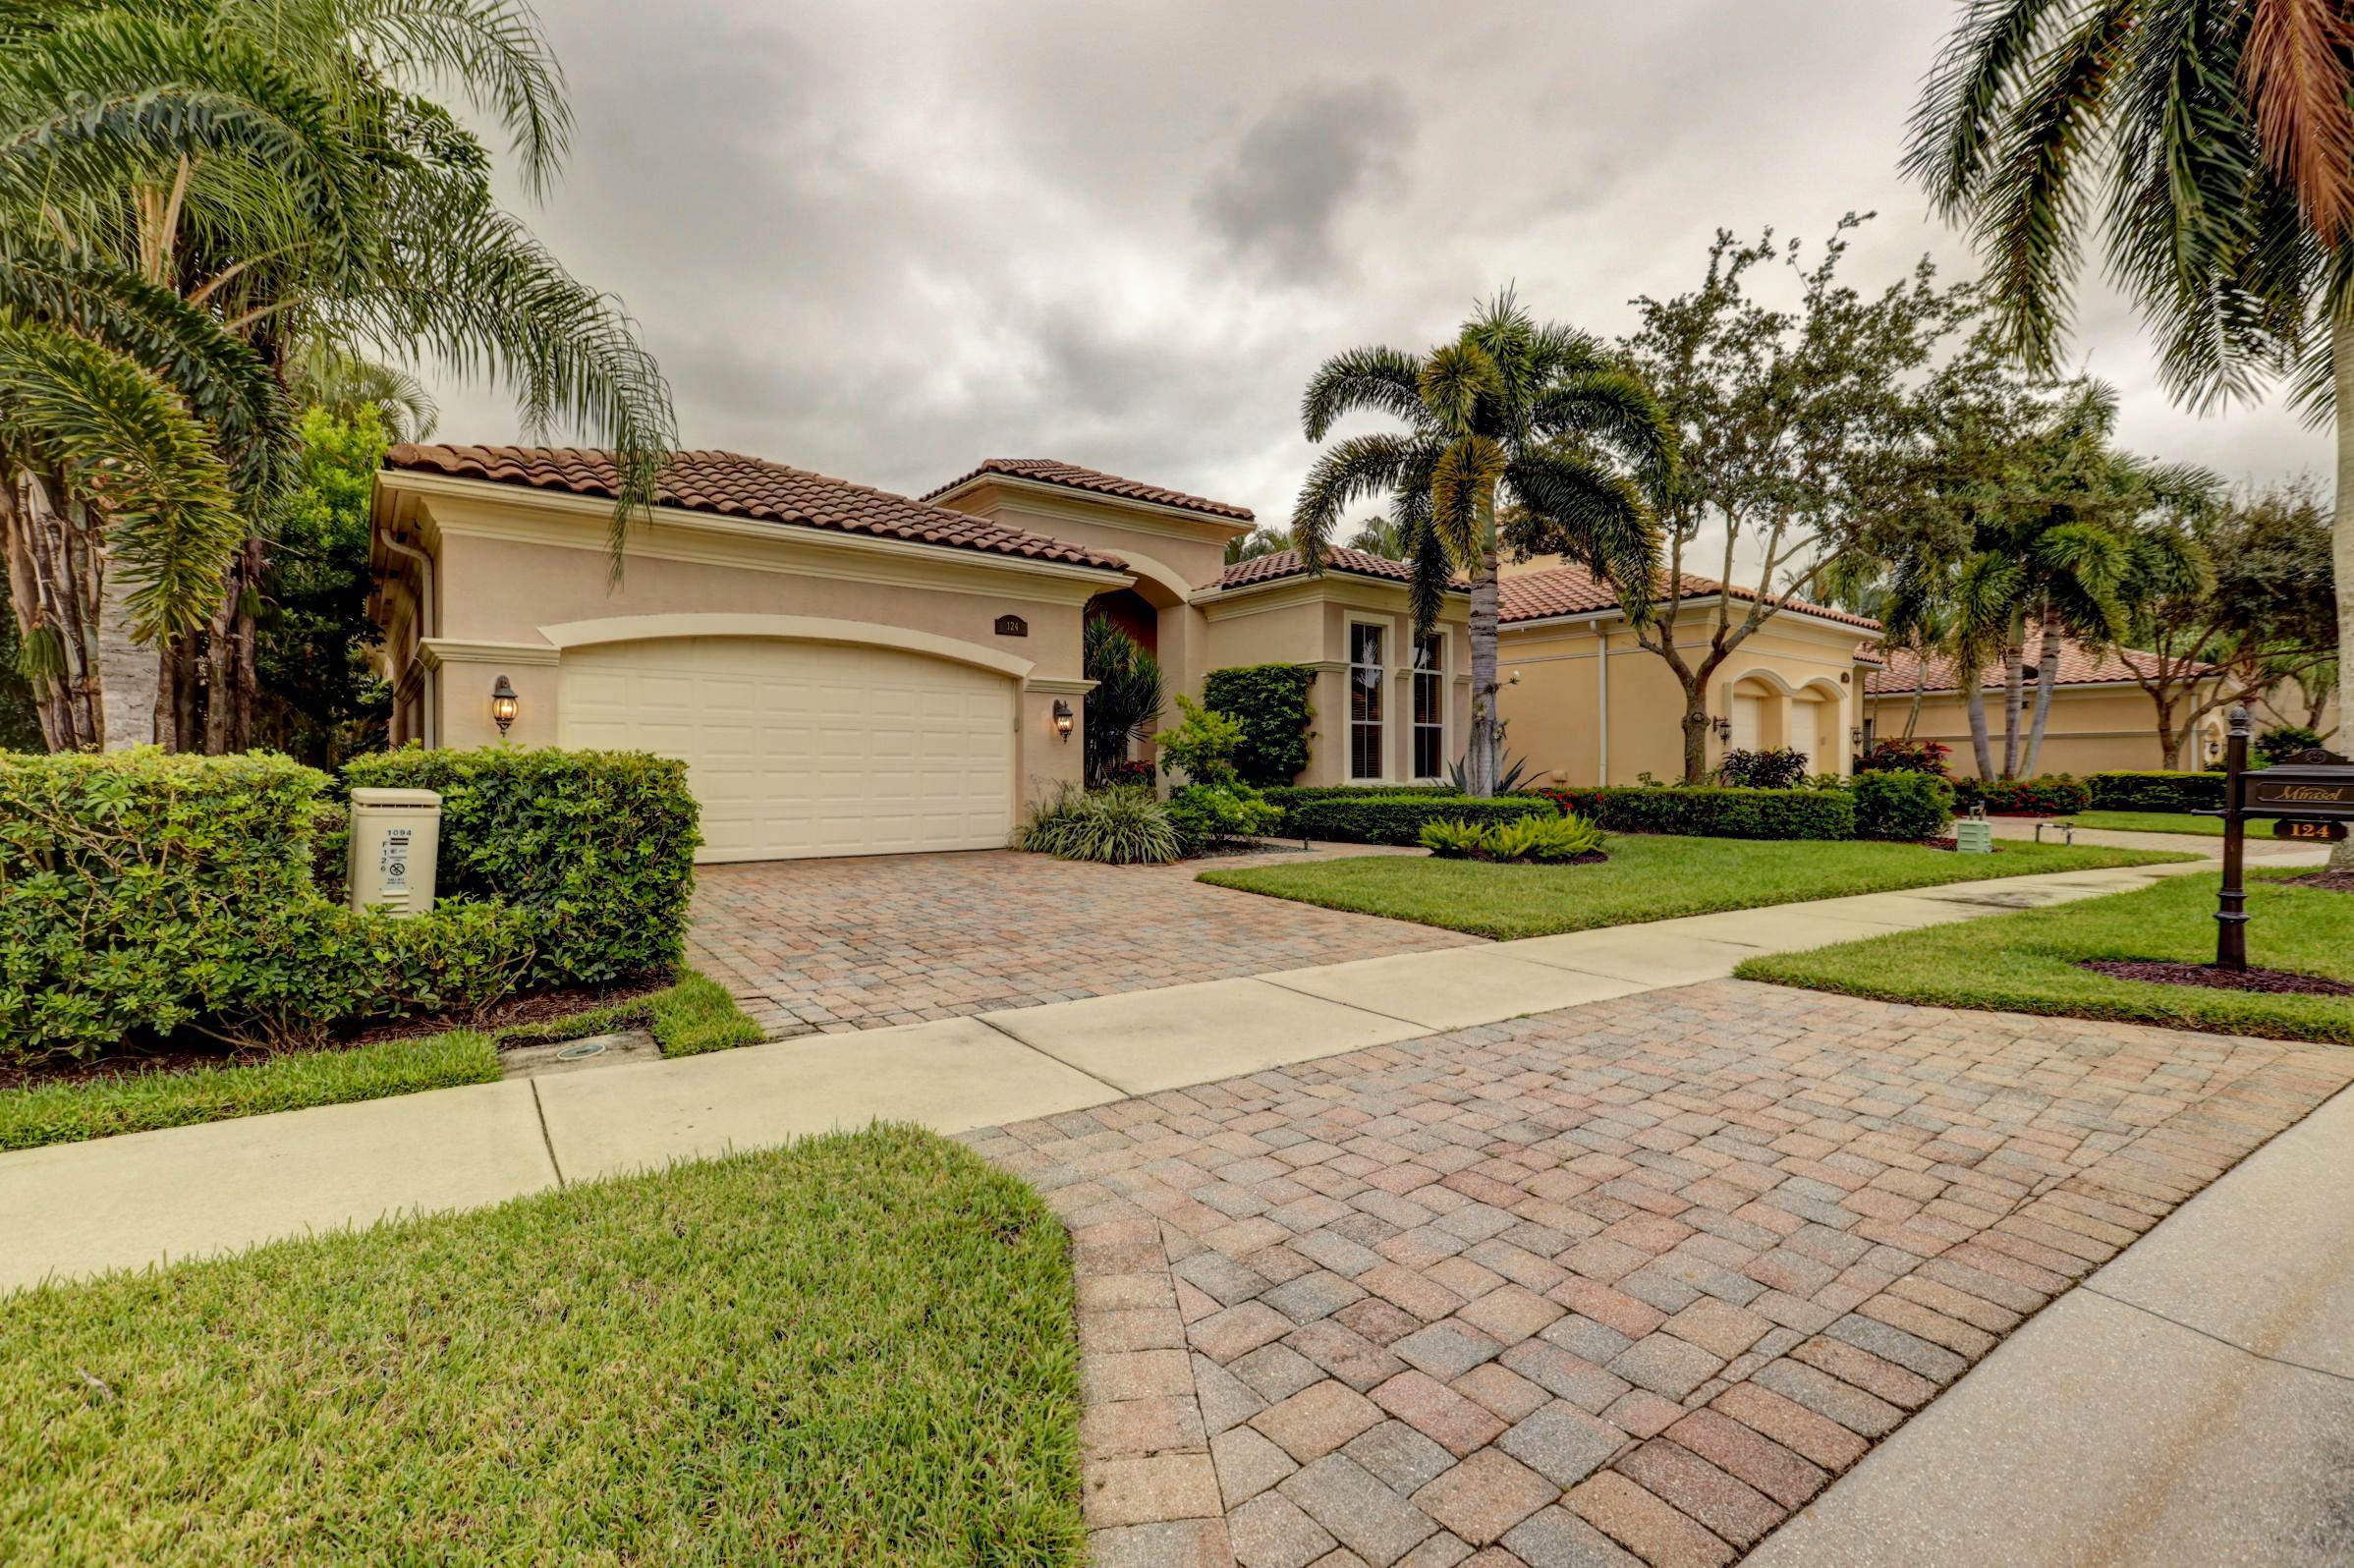 124 Siesta Way, Palm Beach Gardens, Florida 33418, 3 Bedrooms Bedrooms, ,3.1 BathroomsBathrooms,A,Single family,Siesta,RX-10584529